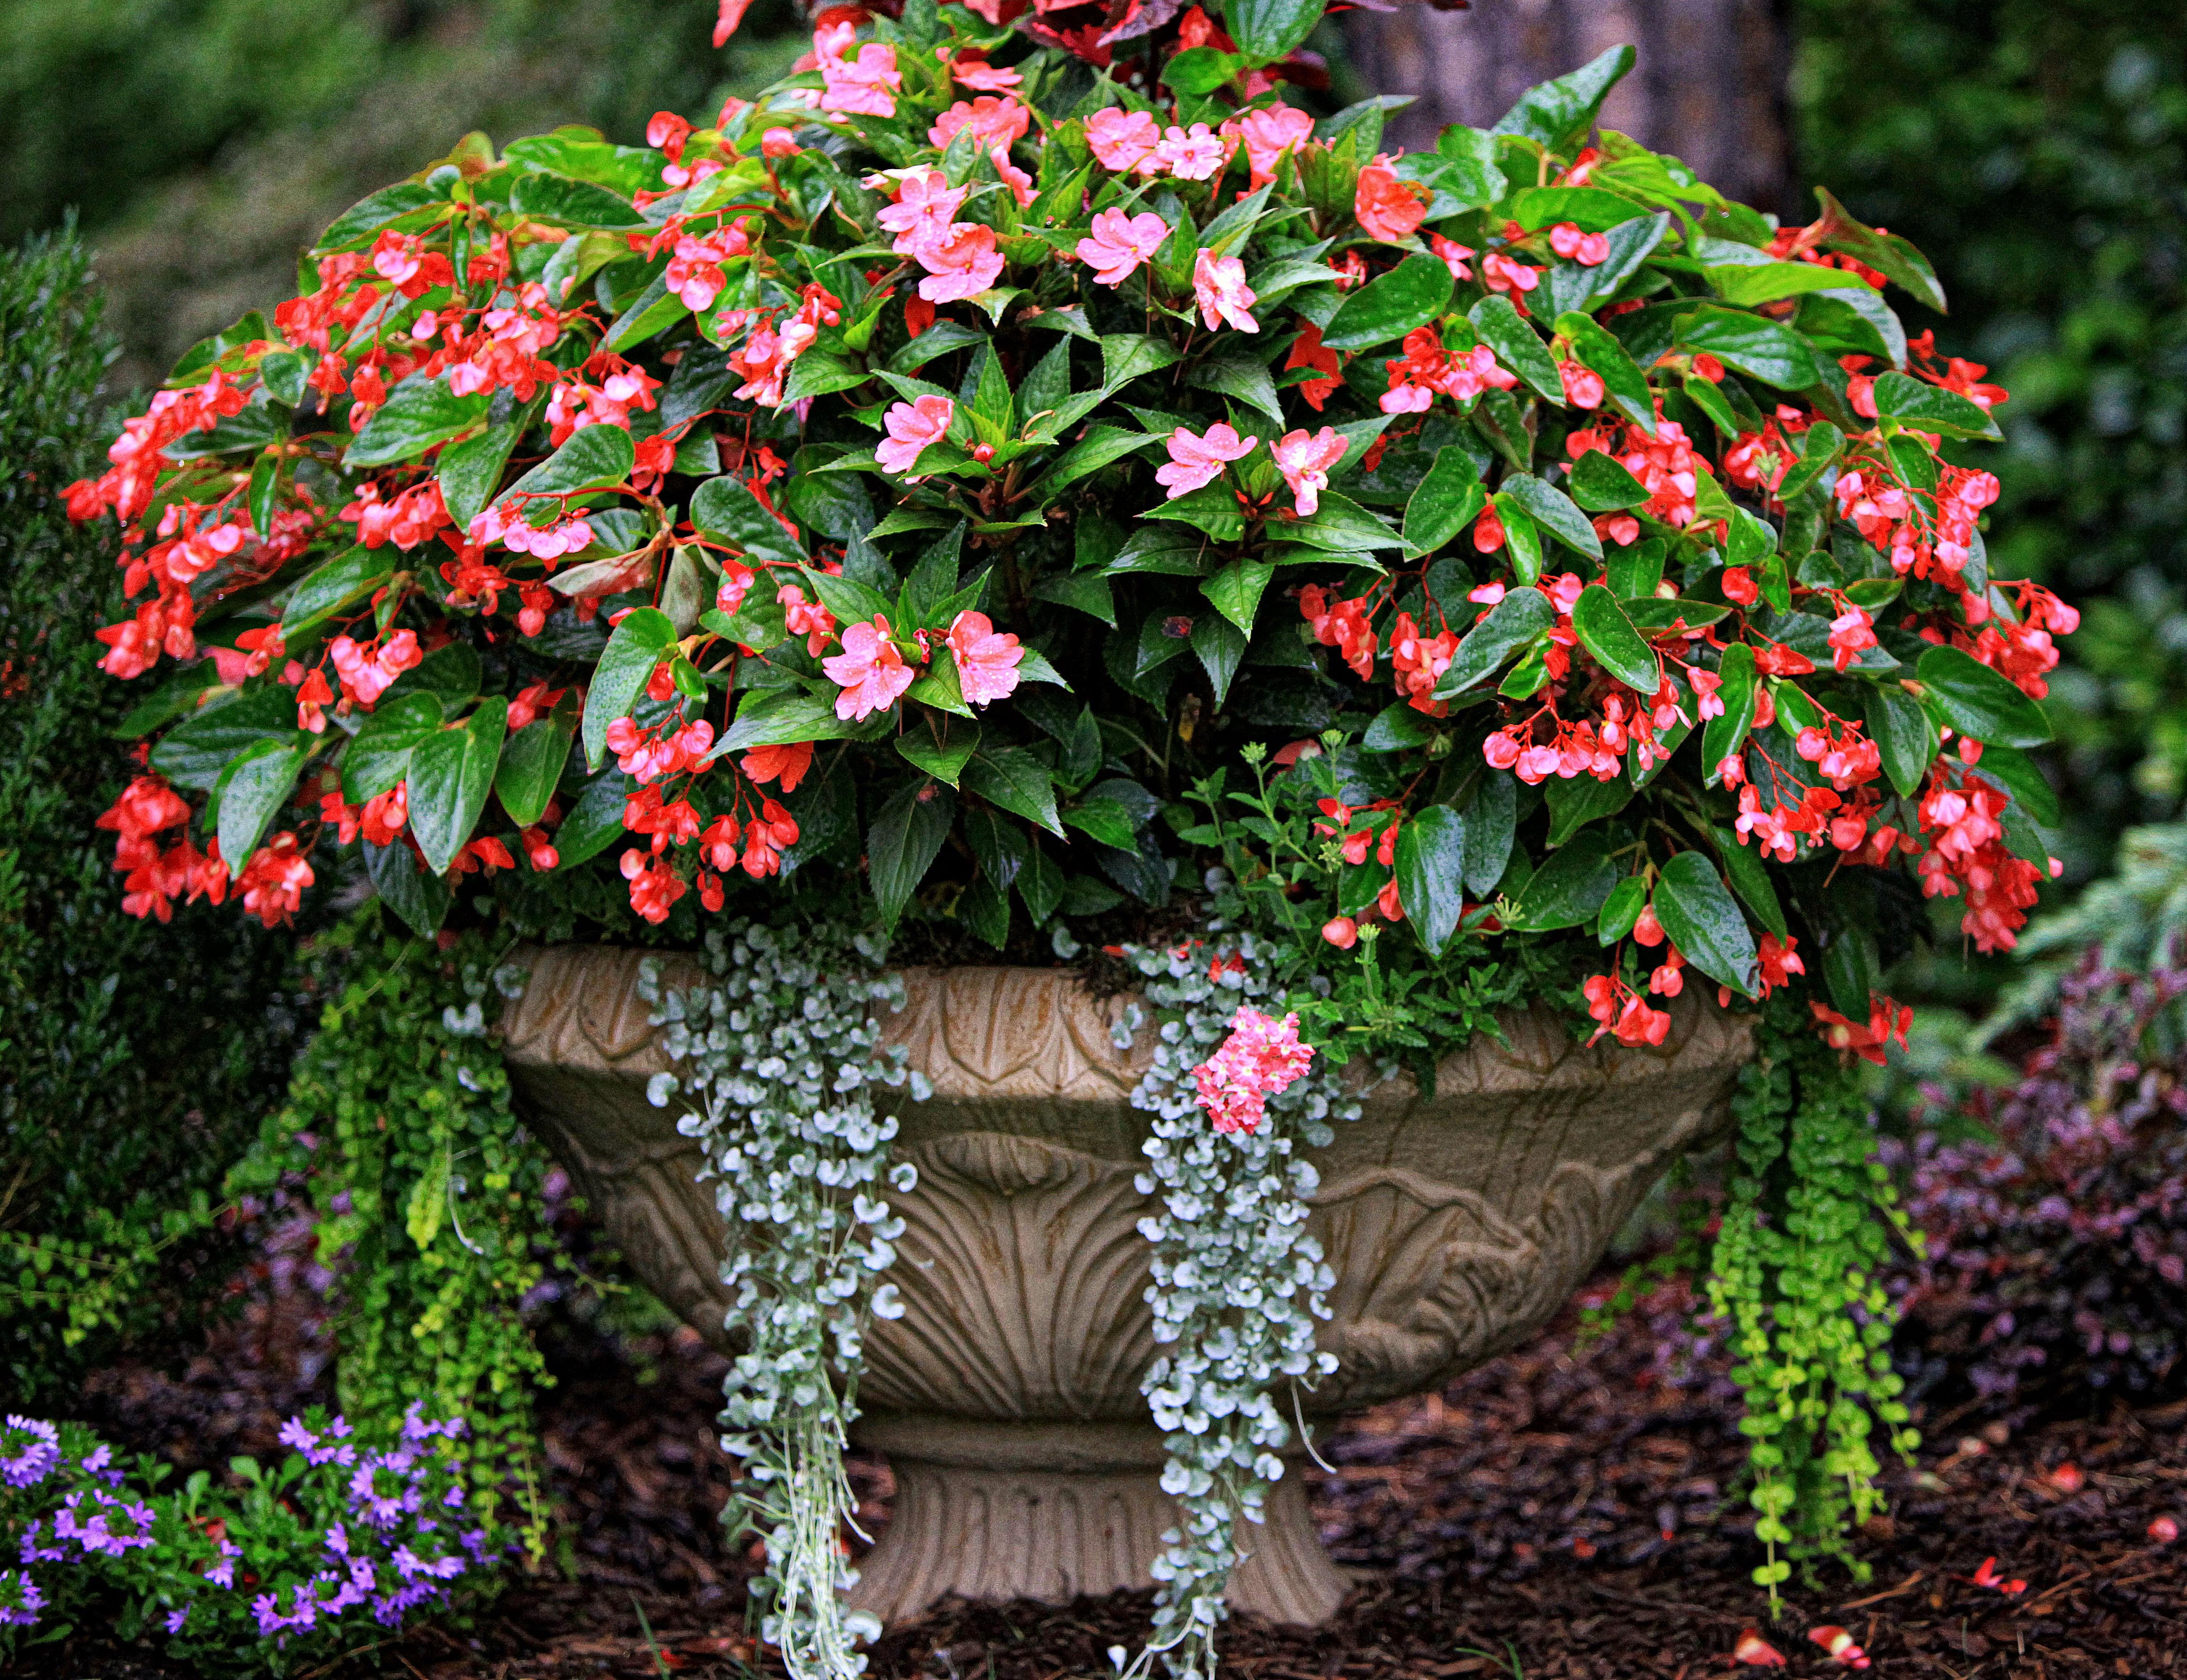 The Graceful Gardener s Containers – The Graceful Gardener